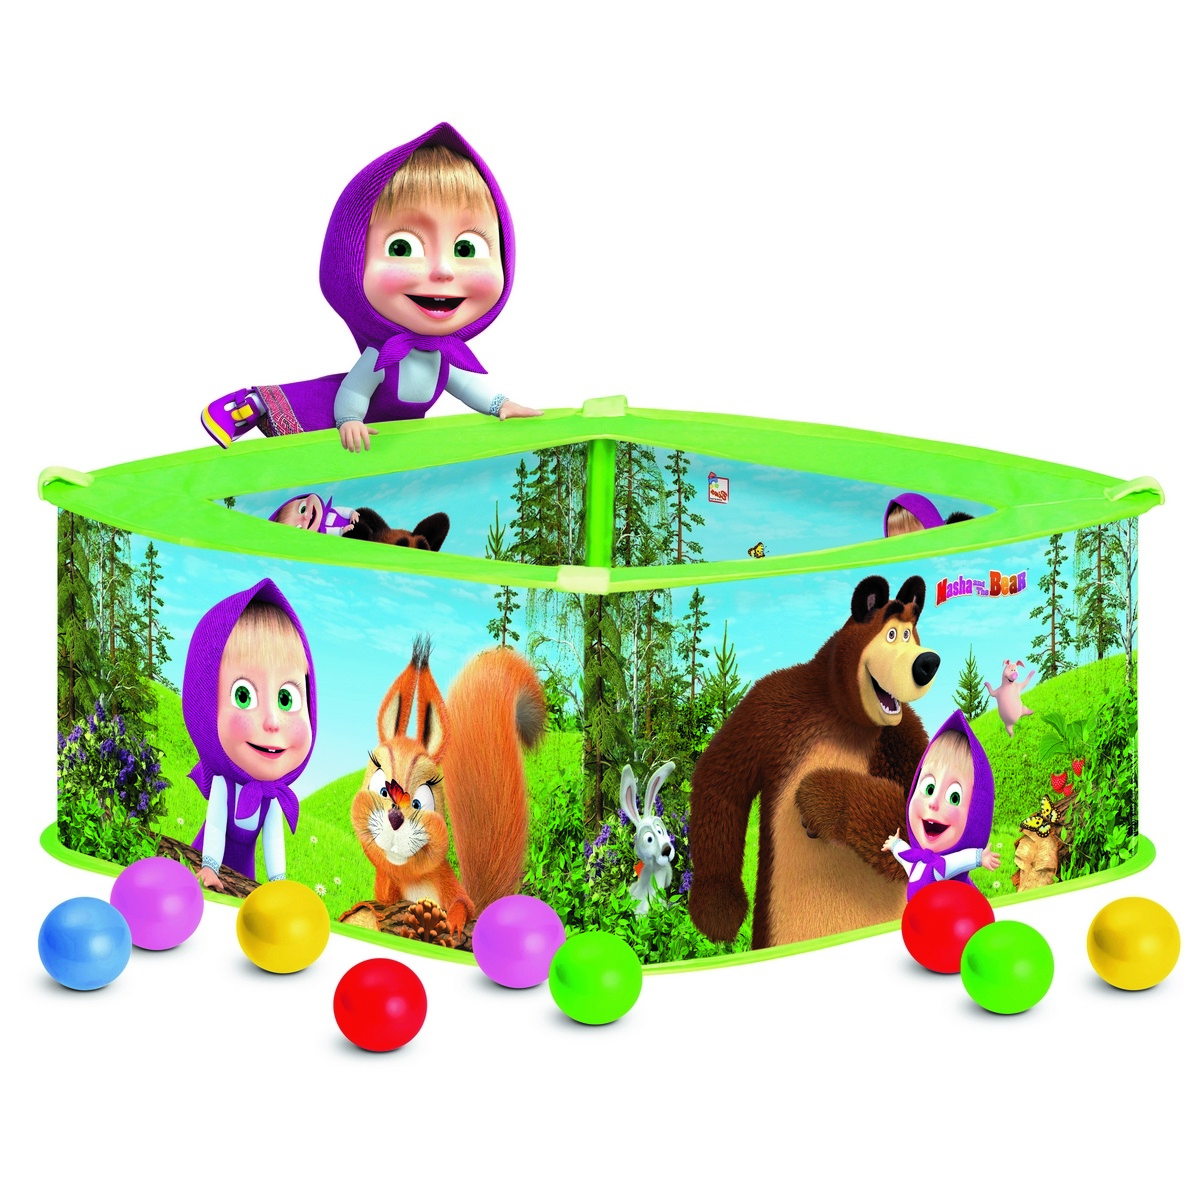 Piscină cu baloane Bino Masha și ursul, 30 x 75x 75 cm imagine 2021 e4home.ro